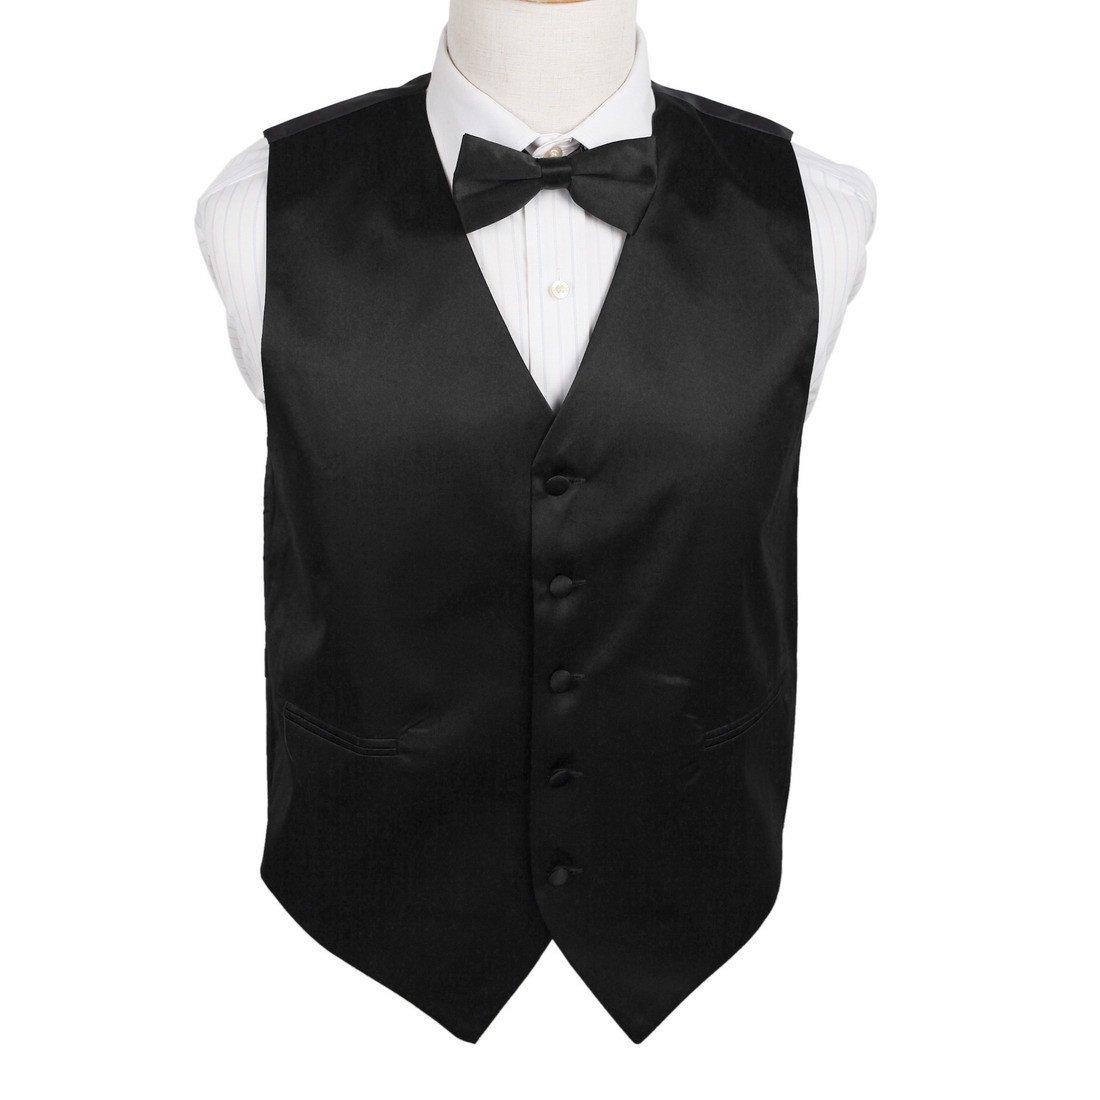 Dan Smith DGEE0001-S Black Plain Microfiber Party Tuxedo Vests Satin Luxury for Evening Vest Matching Bow Tie